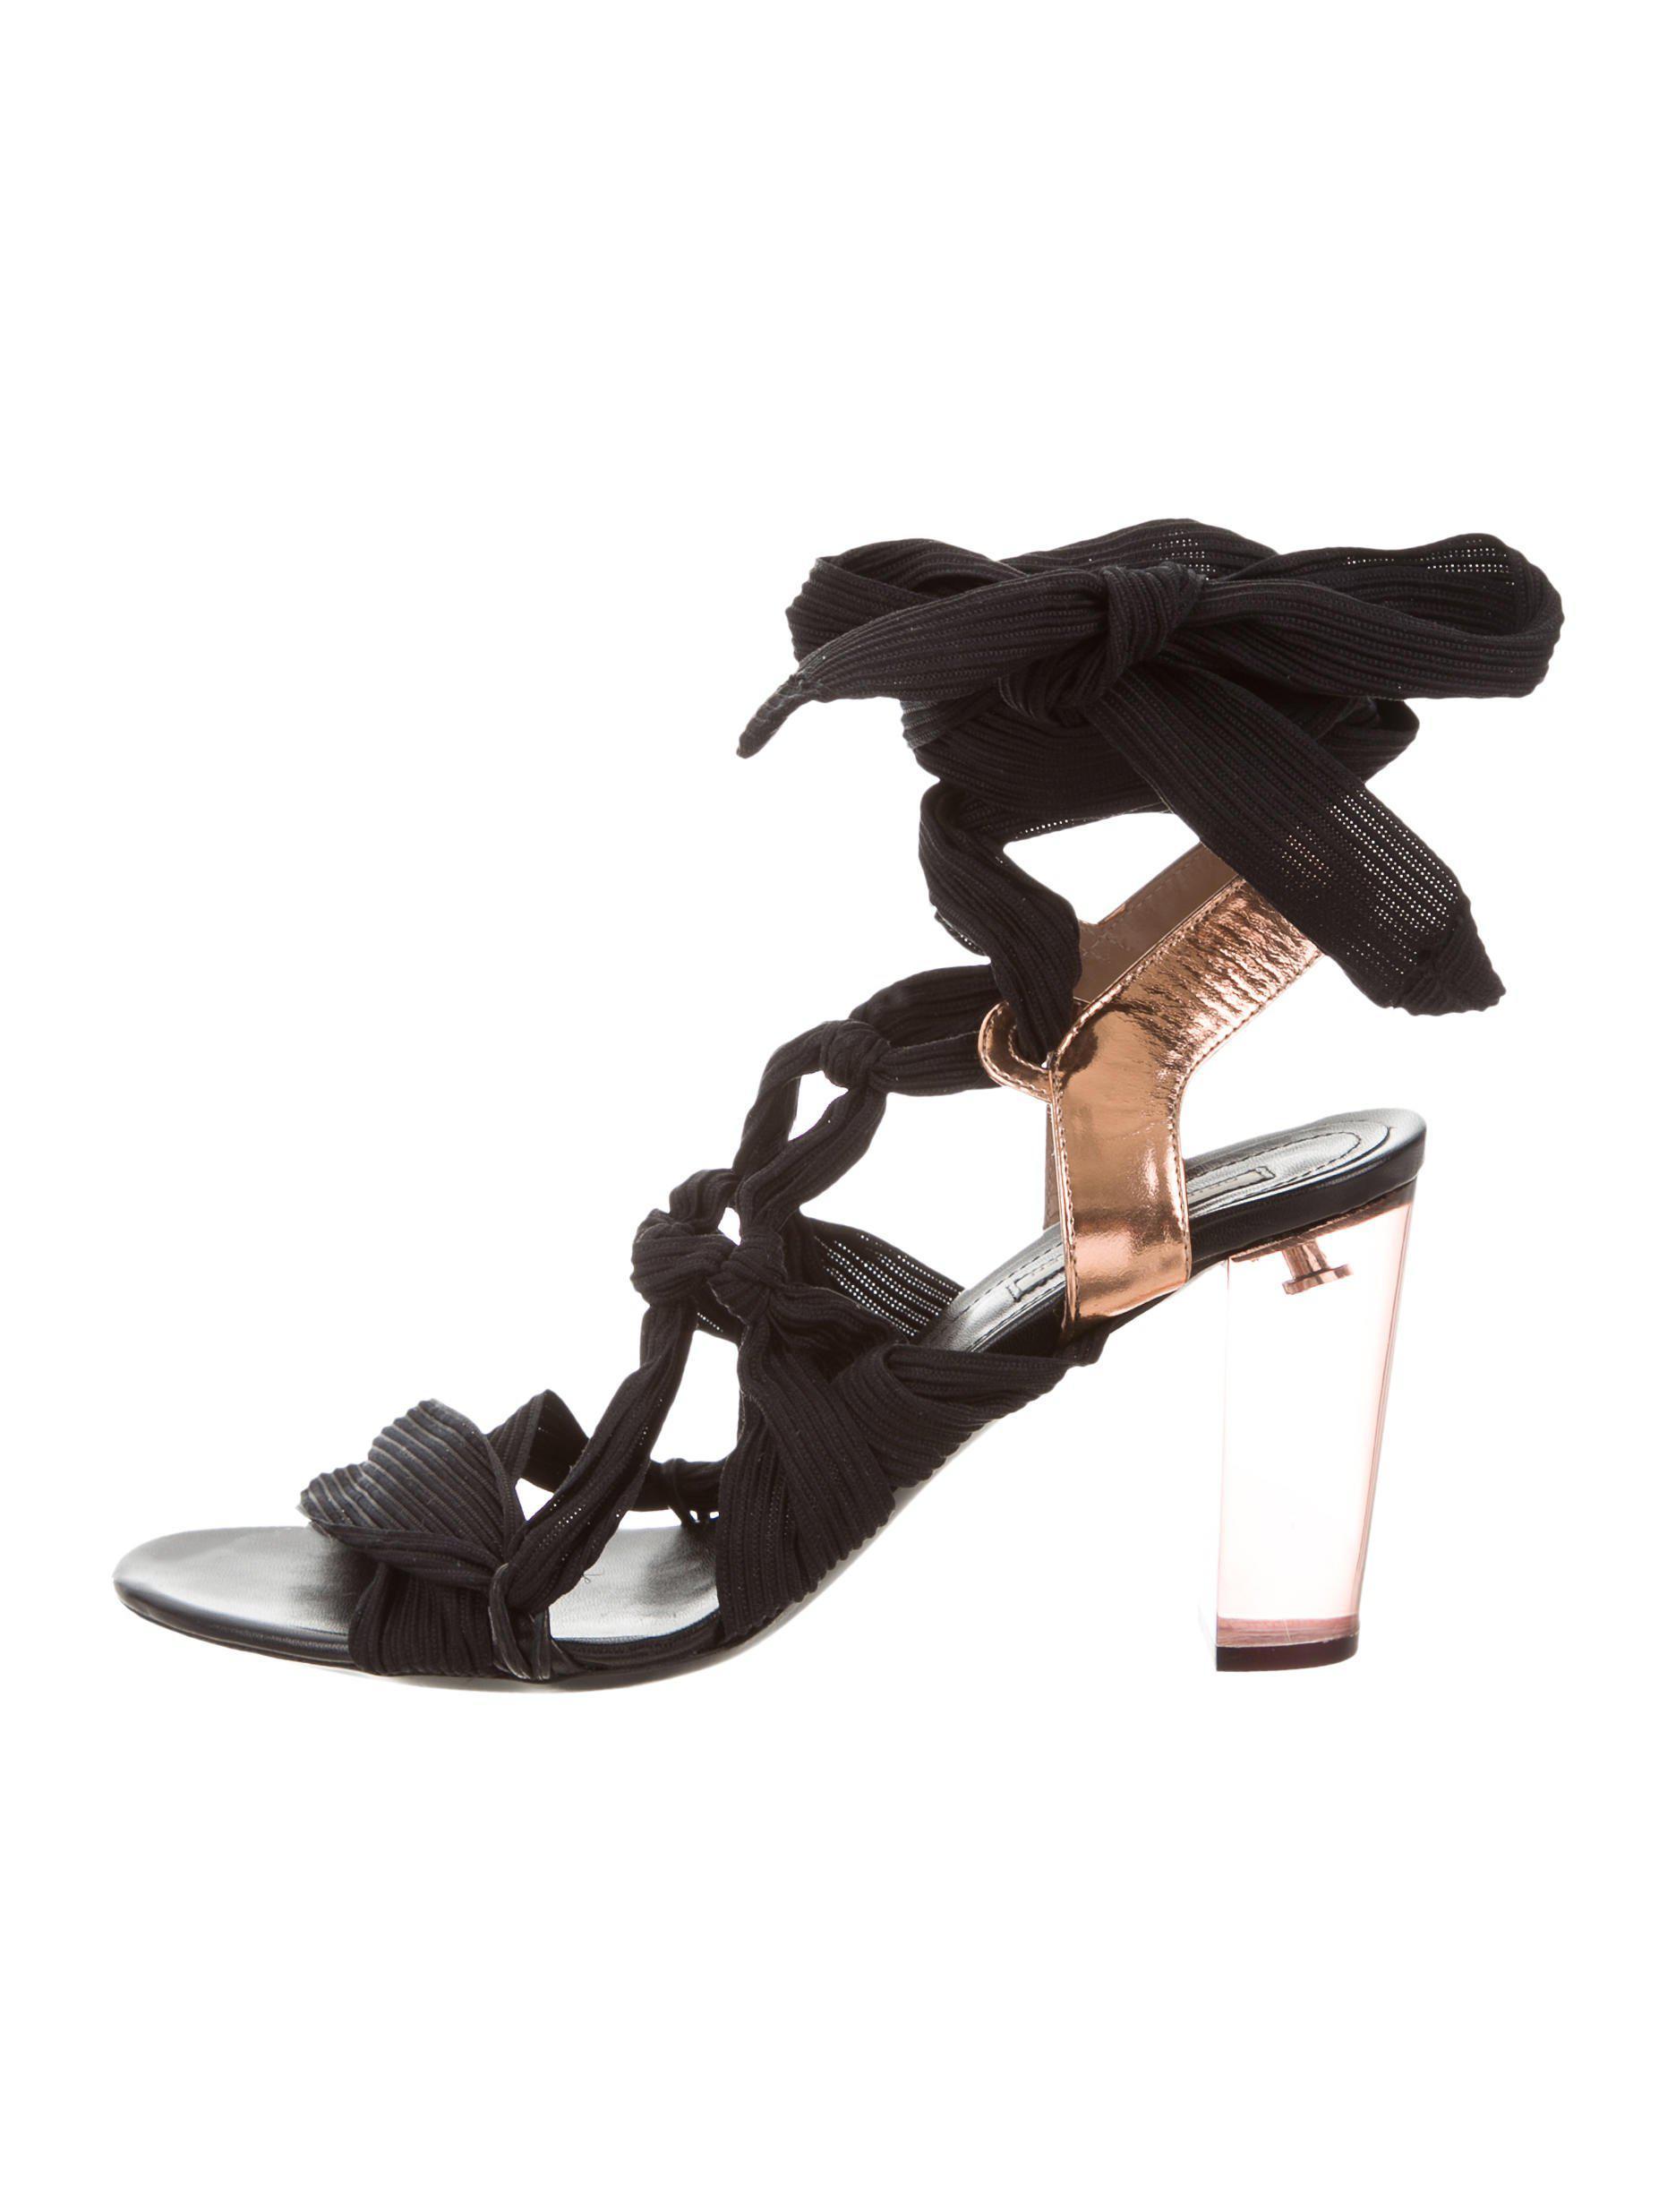 authentic sale online the cheapest cheap price Dries Van Noten Suede Wrap-Around Sandals cheap sale perfect discount best RATb5LOD